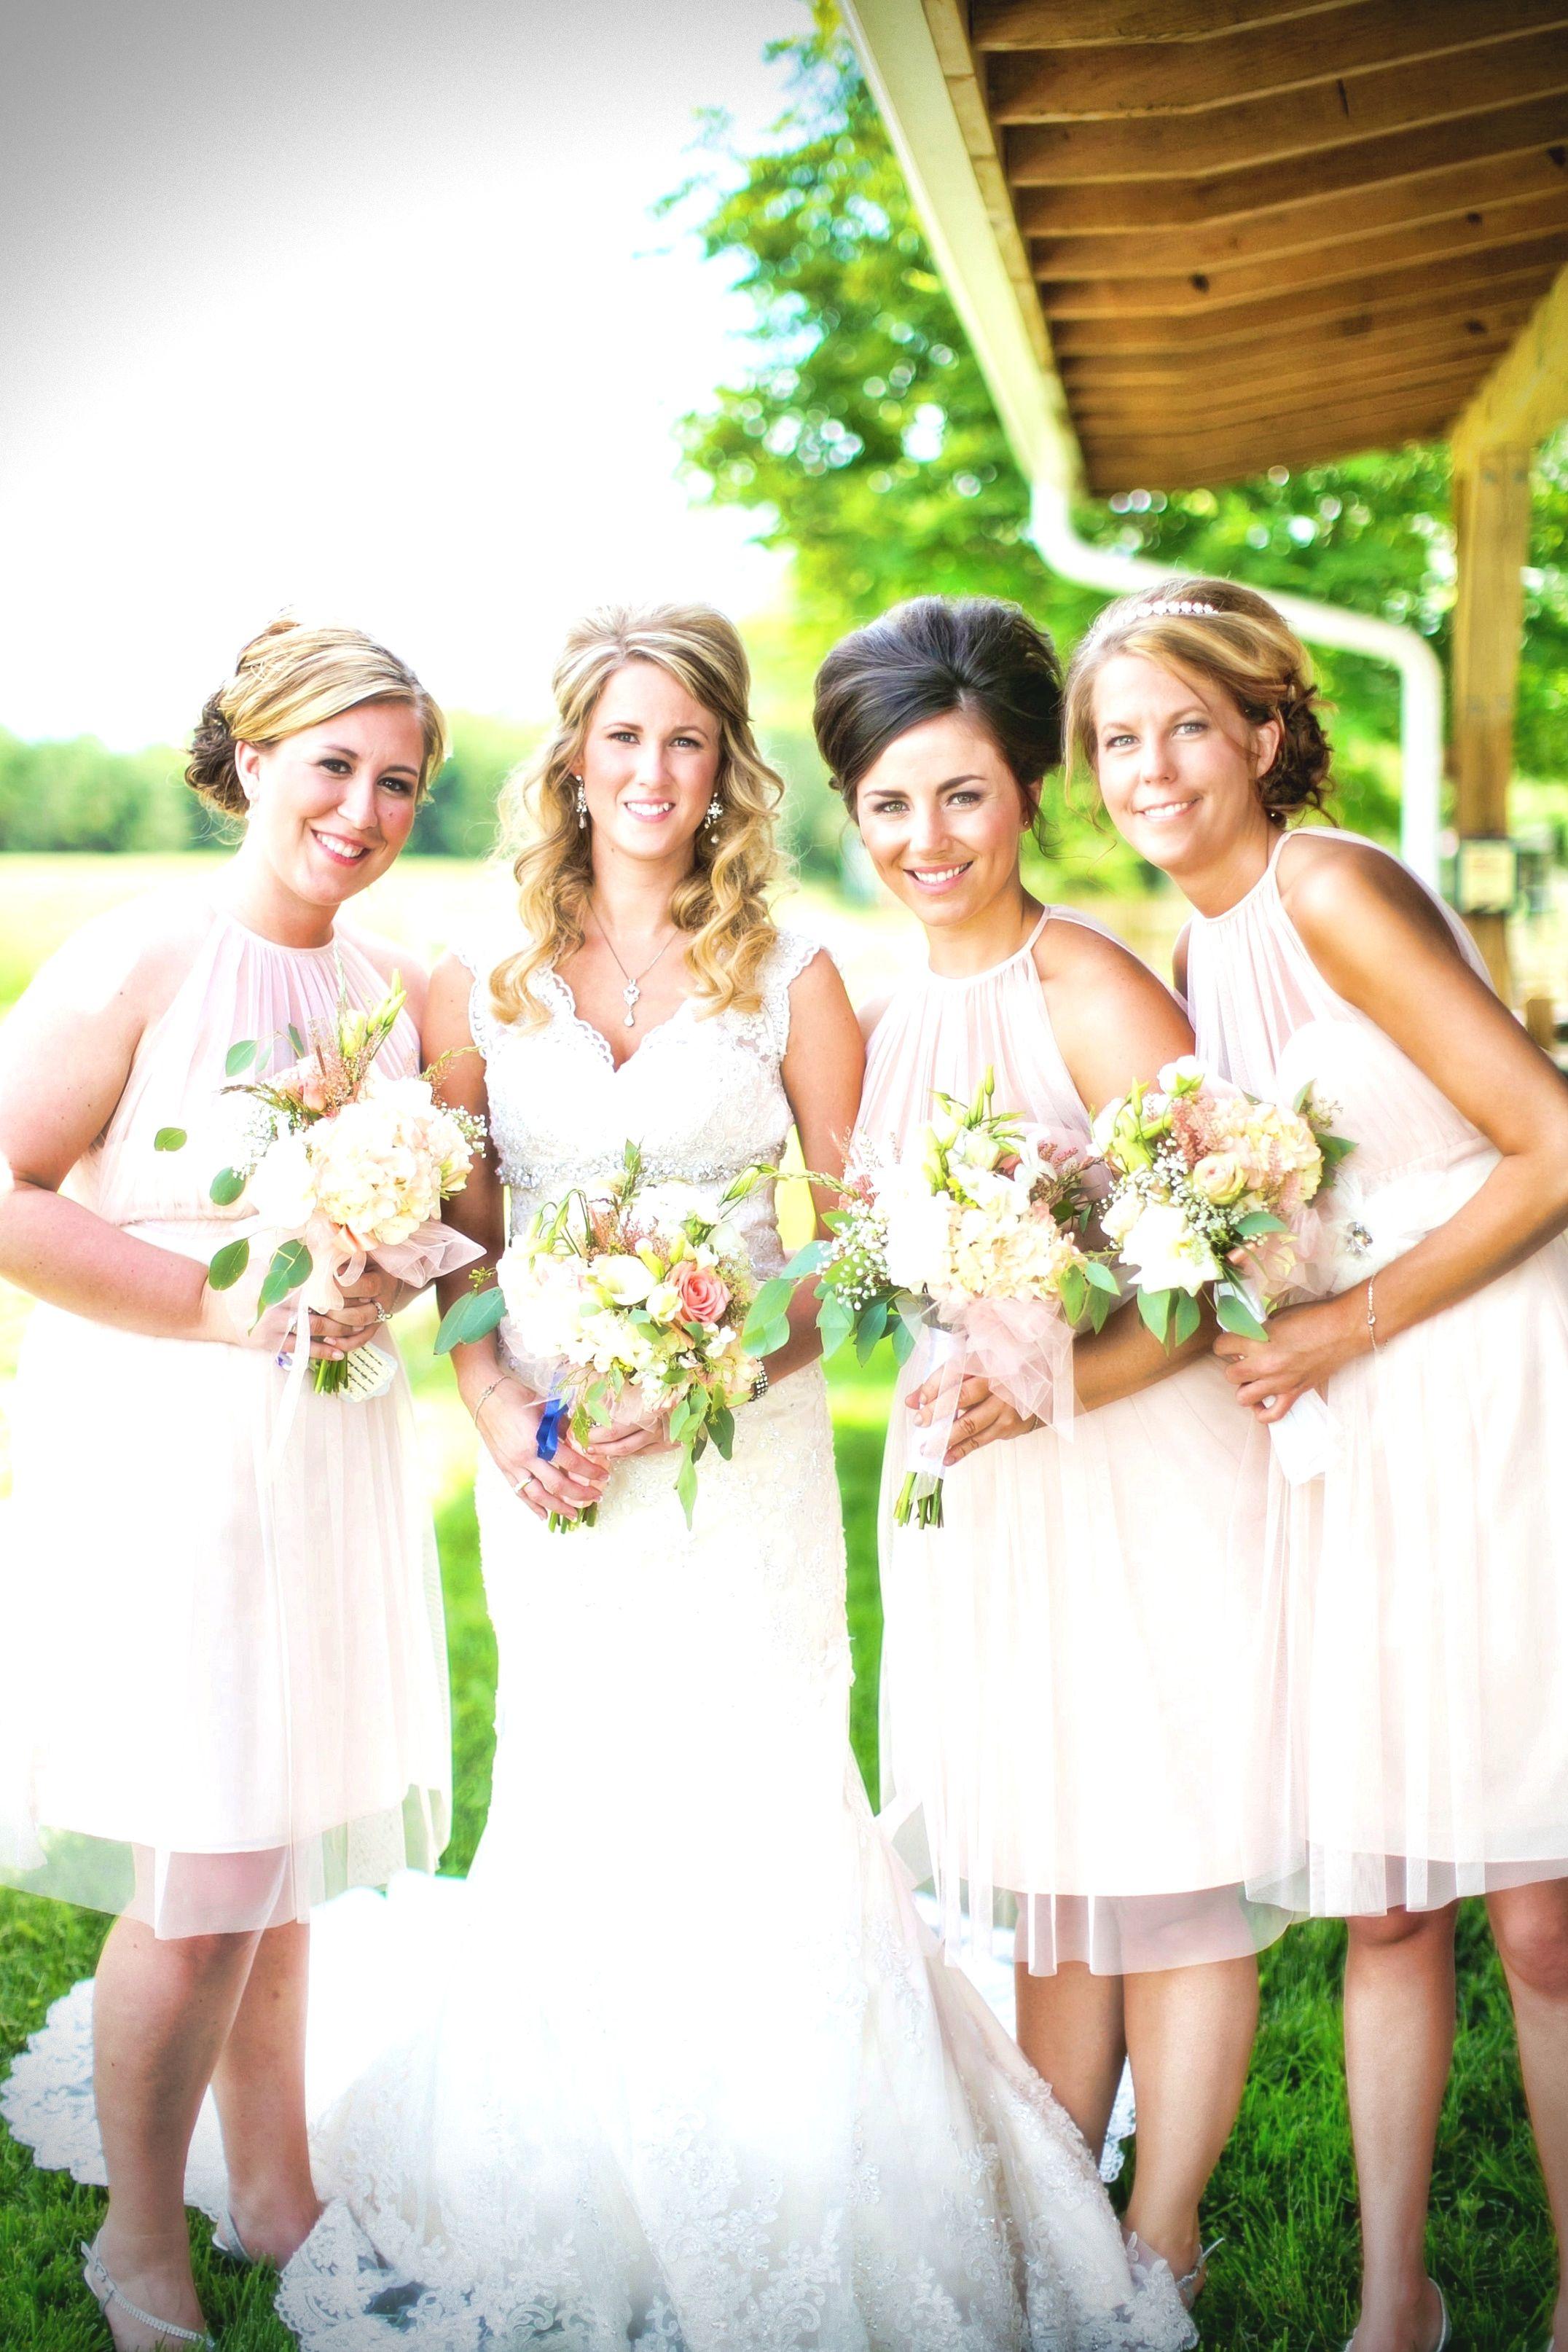 b04df137d8b7 Azazie Bridesmaid Dresses Coupon - raveitsafe